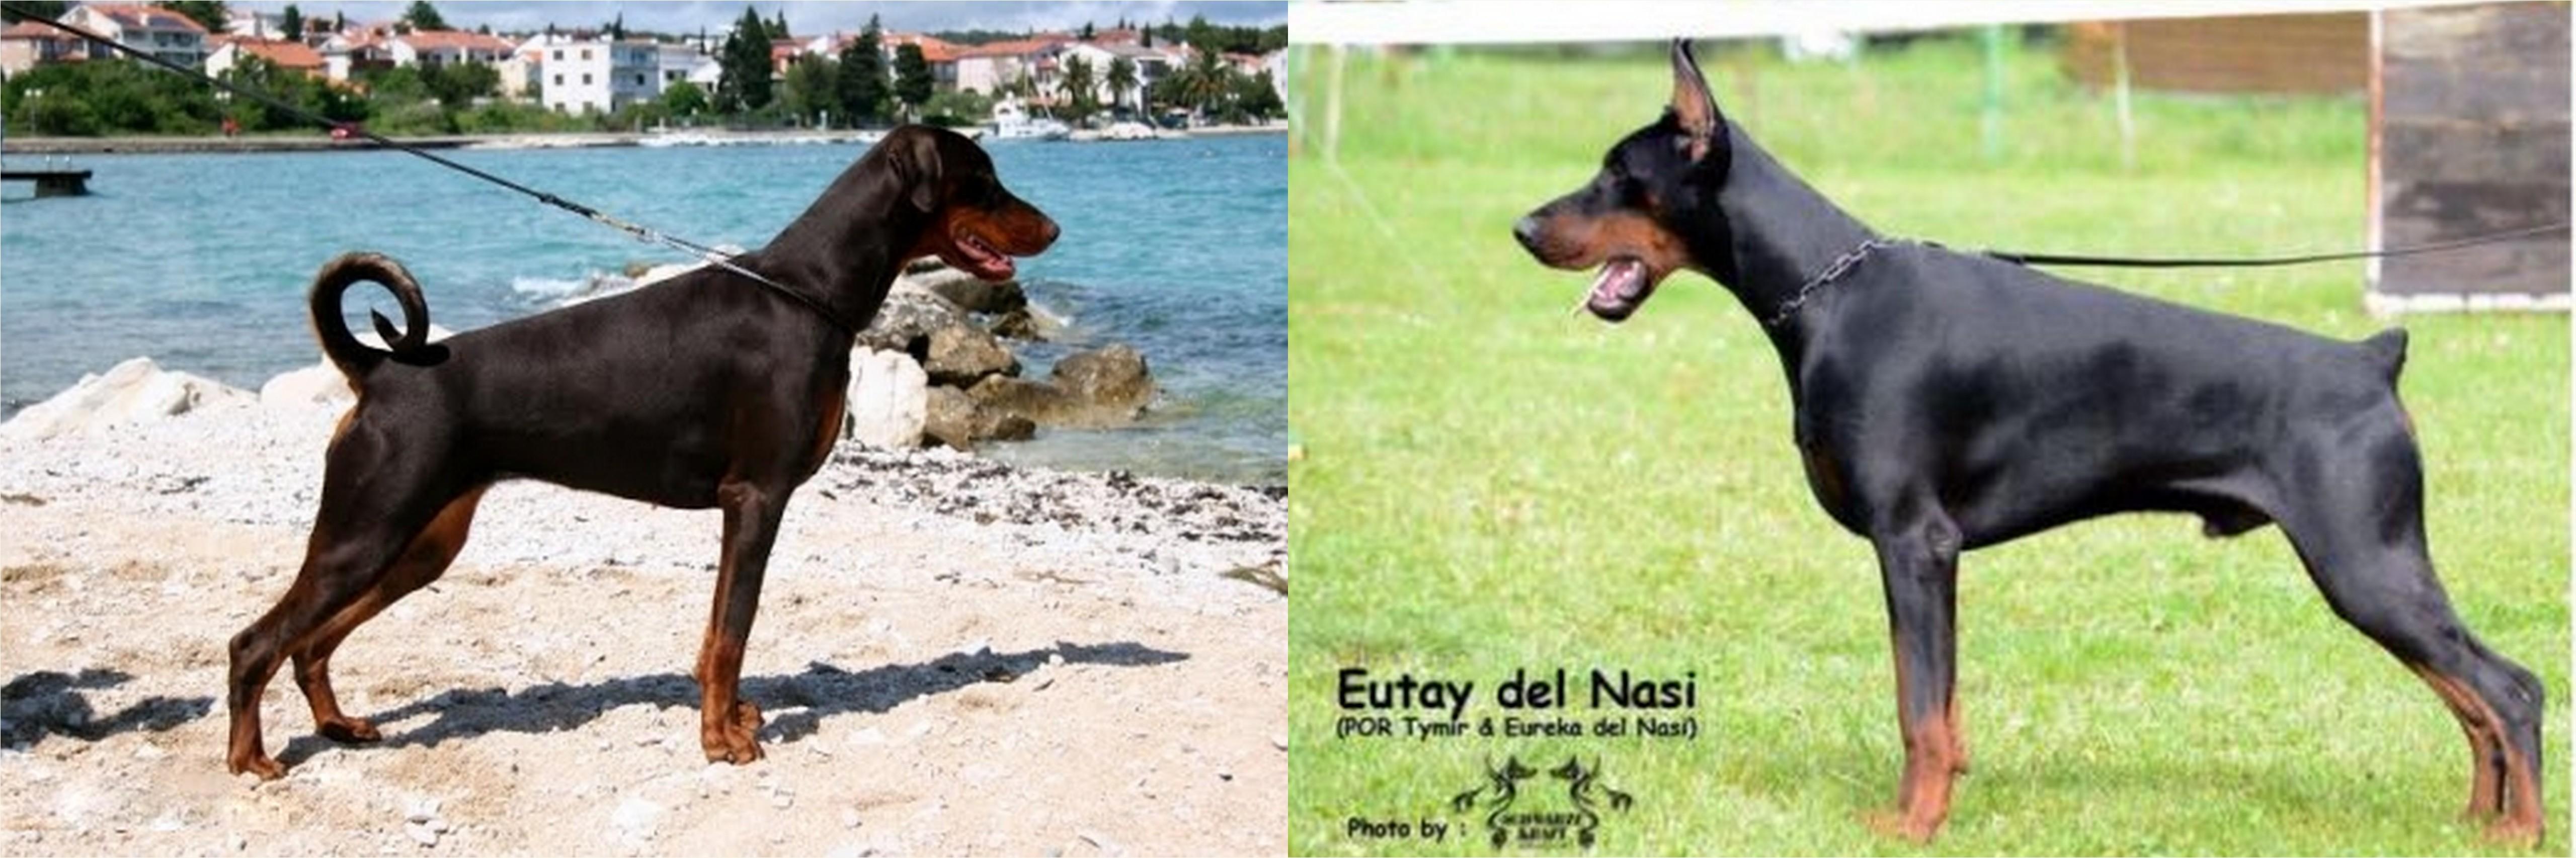 Fedra Best of Island x Eutay del Nasi